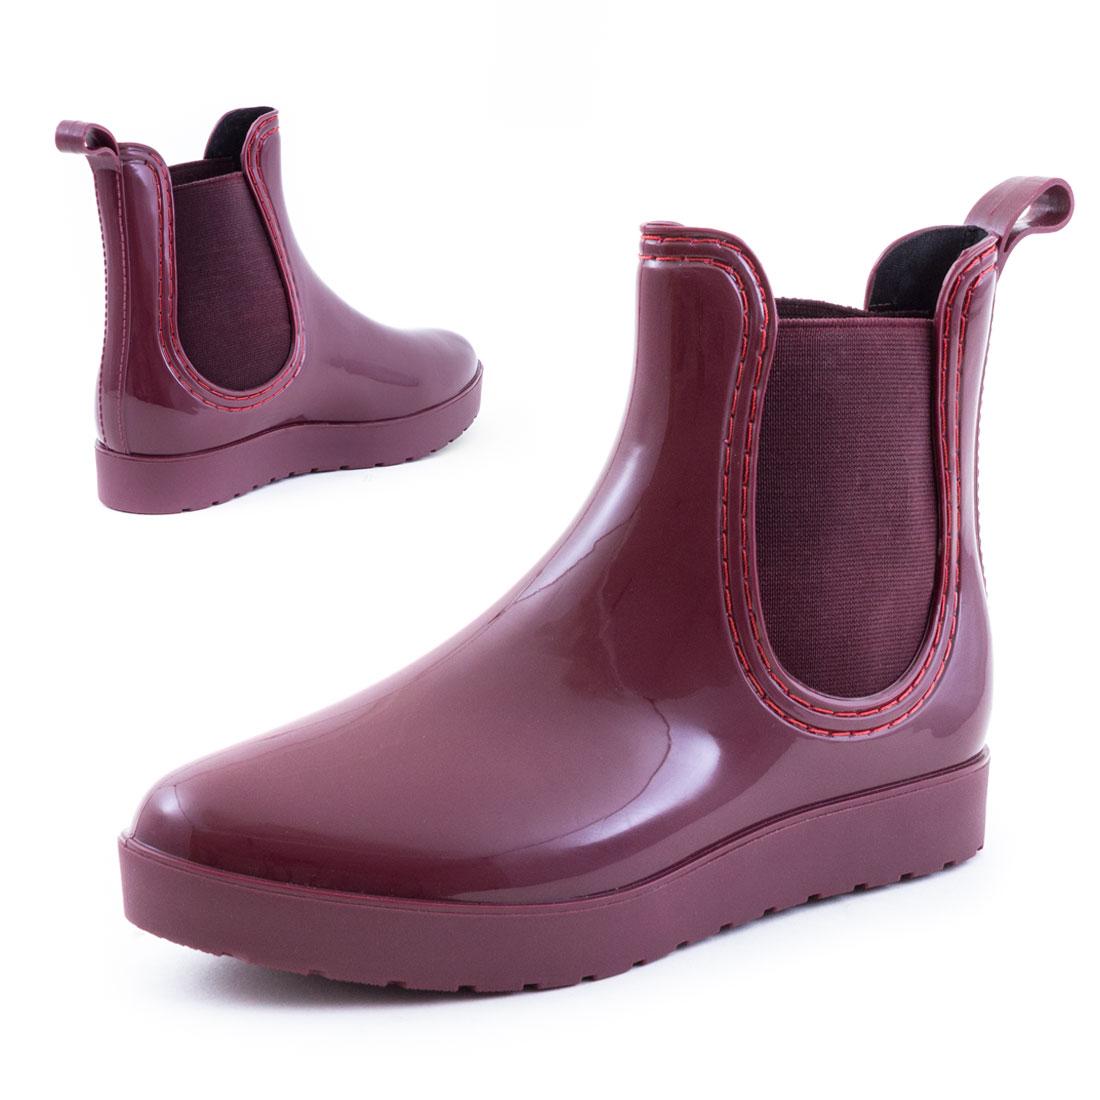 neu damen chelsea lack boots plateau gummistiefel herbst. Black Bedroom Furniture Sets. Home Design Ideas